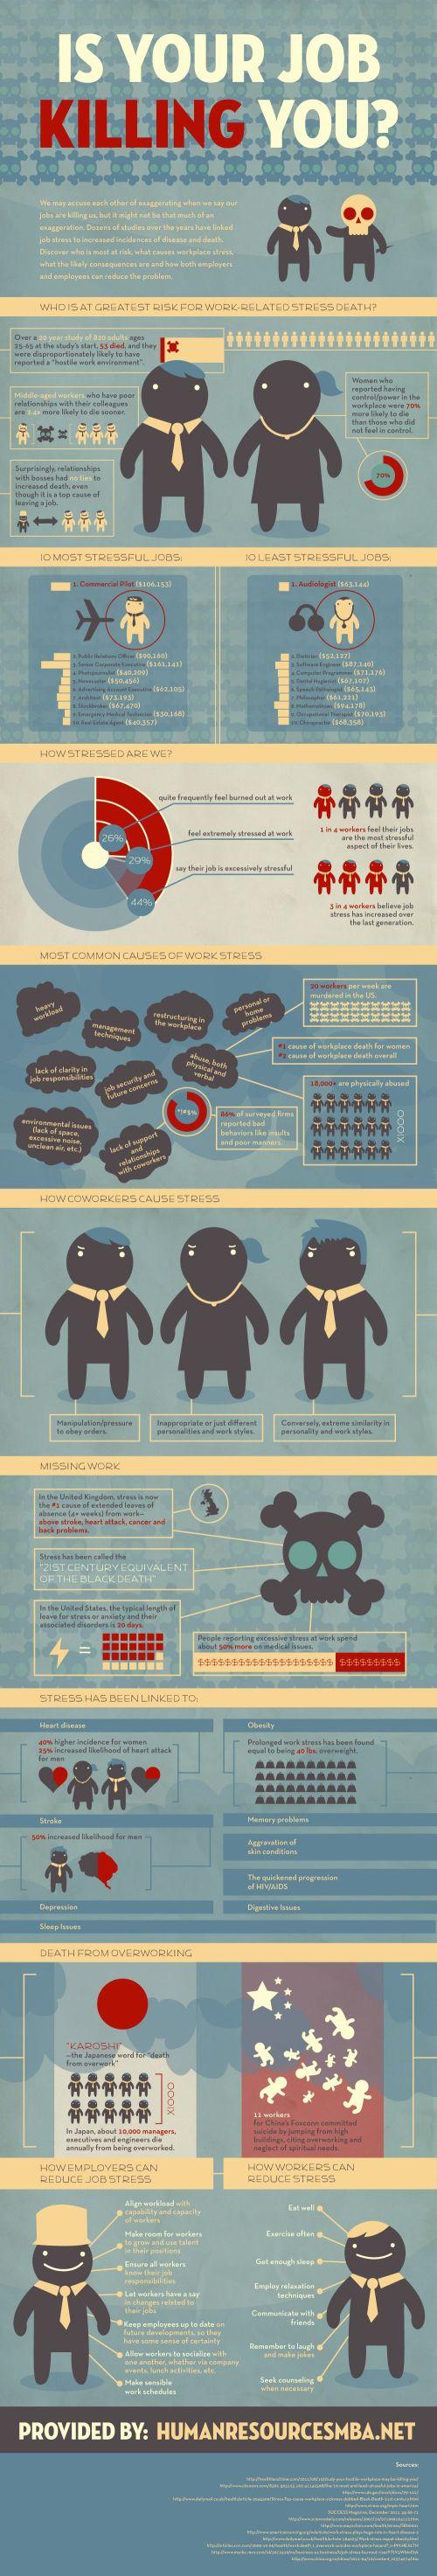 Is Job Stress Killng You?